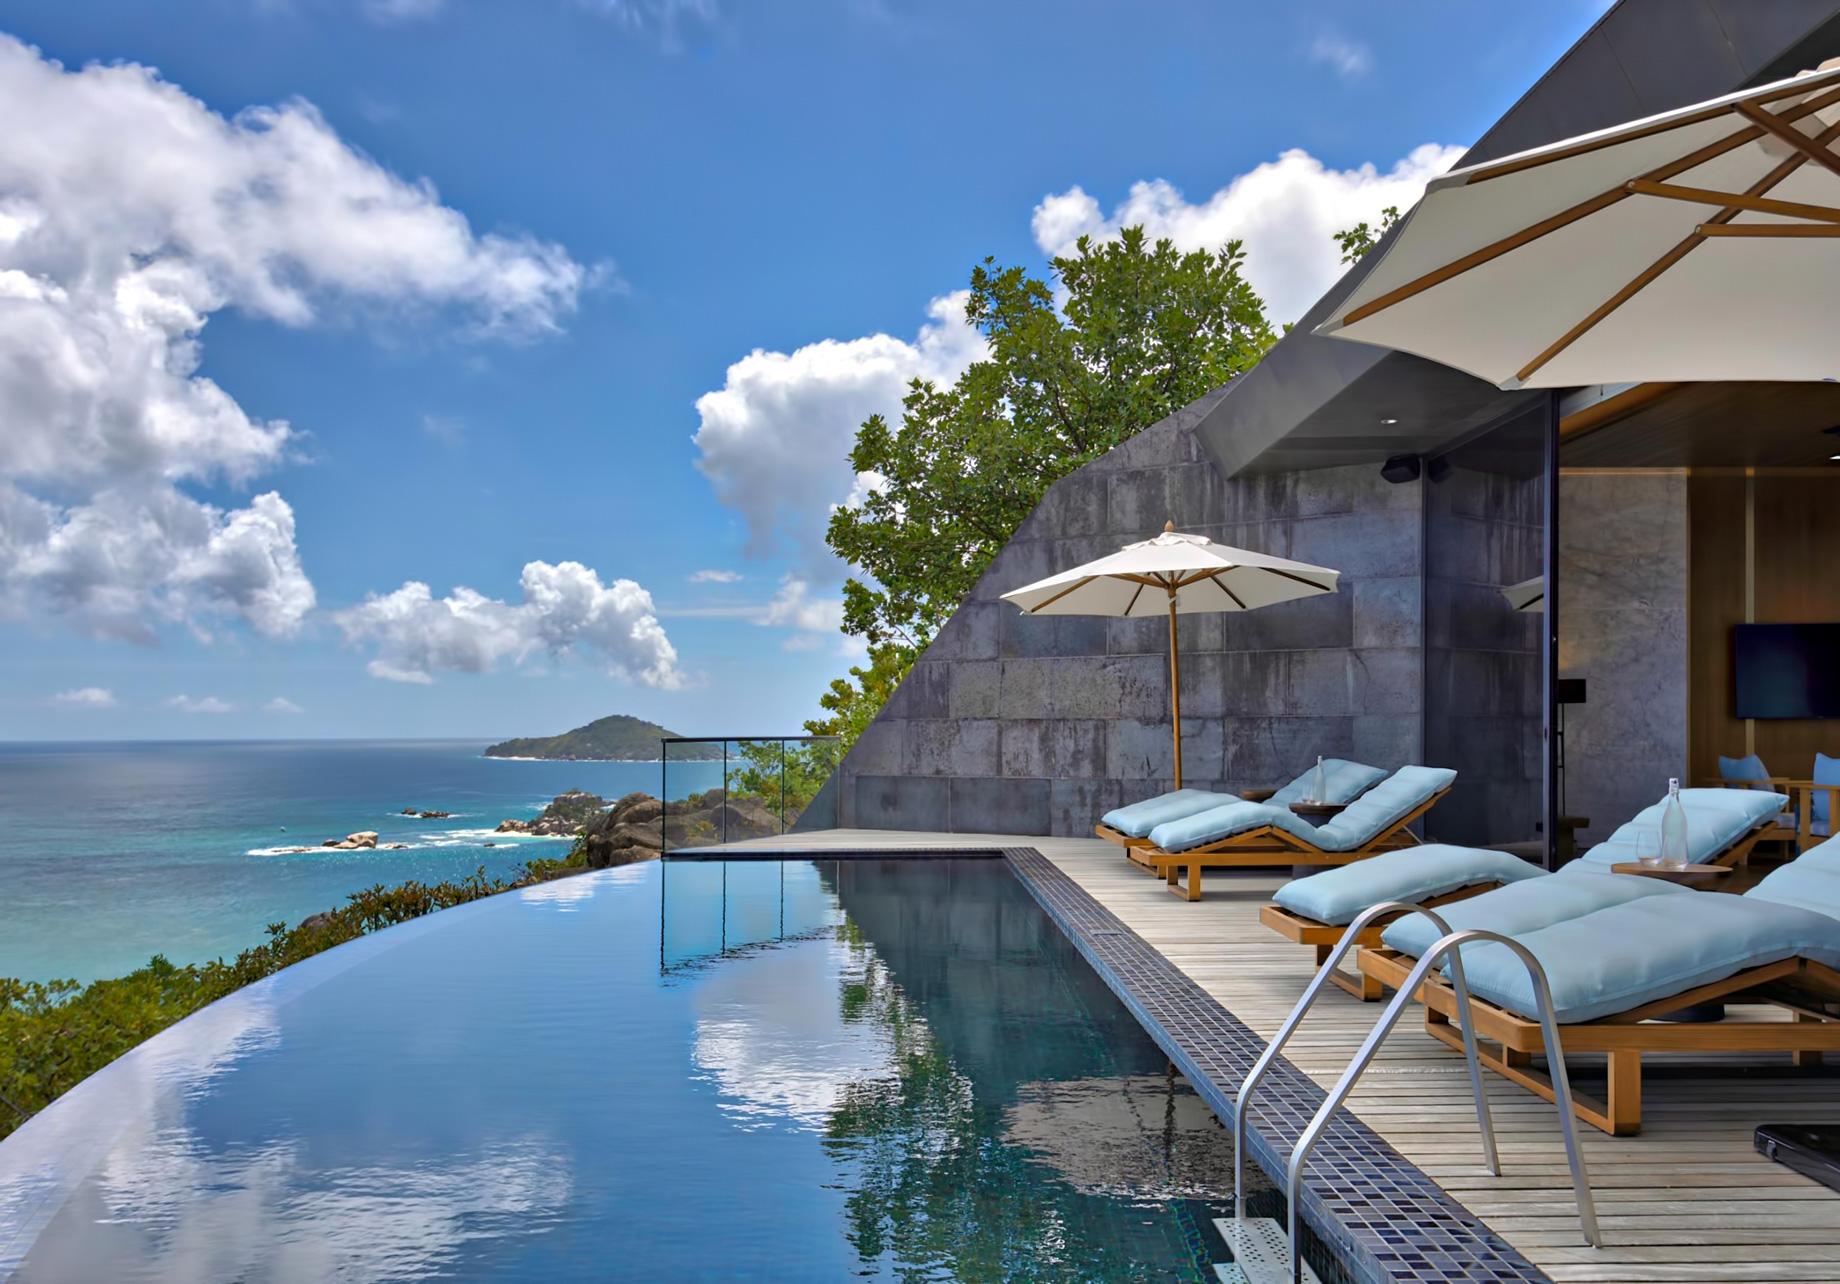 Three Bedroom Luxury Residence - Felicite Island, Seychelles - Infinity Pool Deck